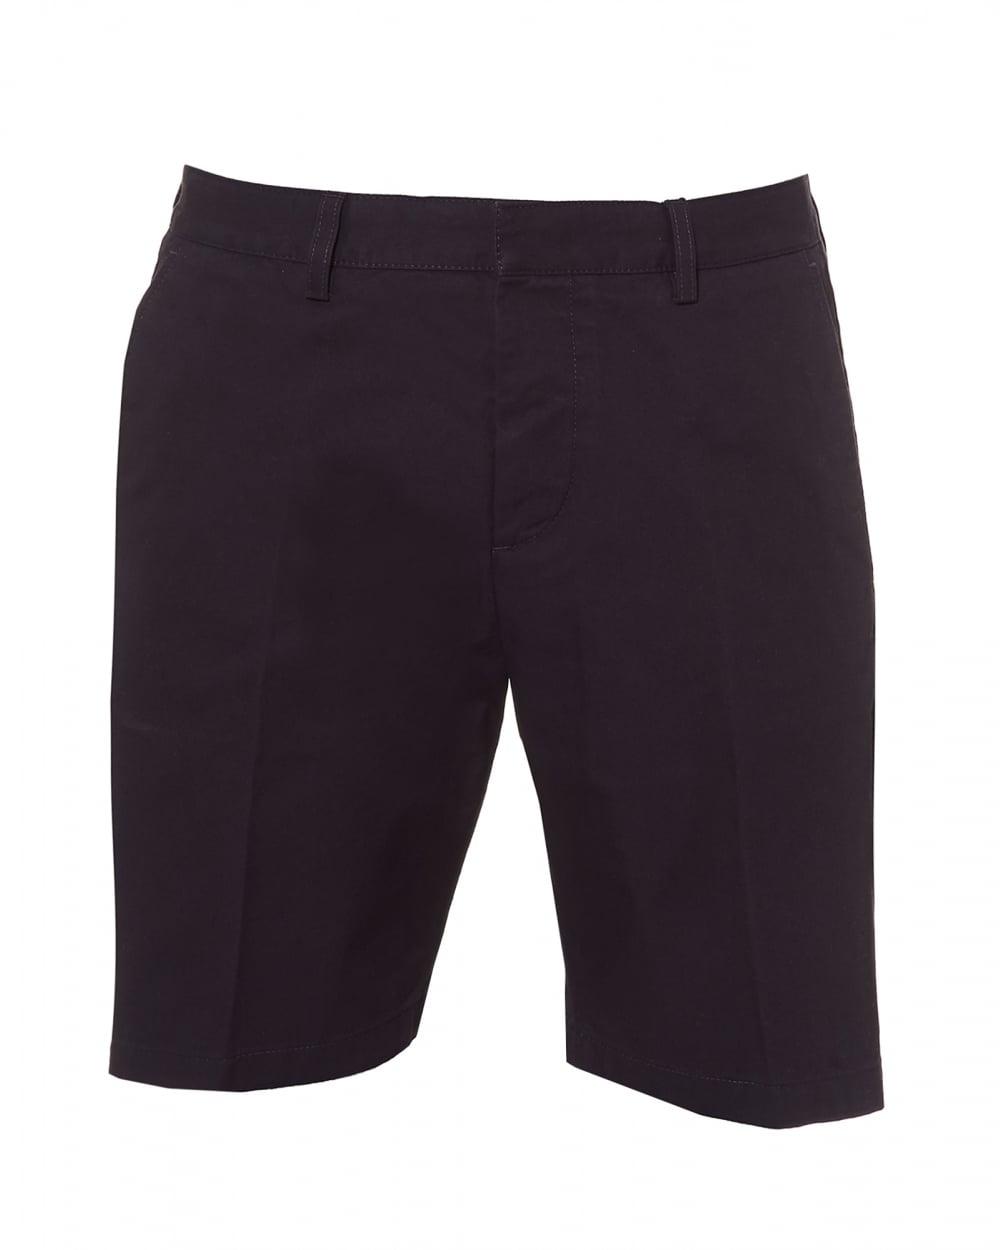 Mens Bermuda Shorts, Tailored Navy Blue Shorts